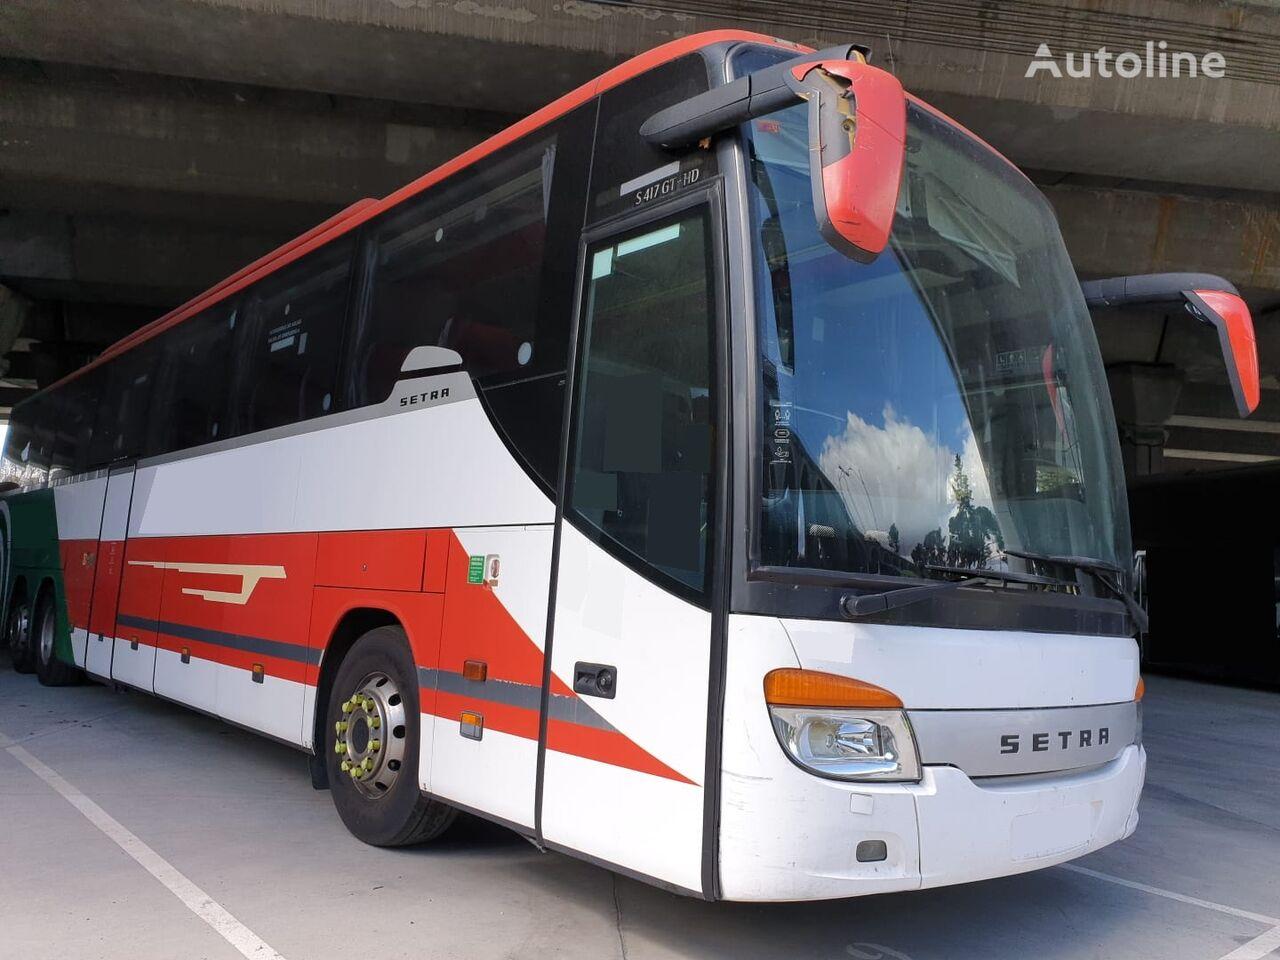 SETRA S 417 GT HD coach bus